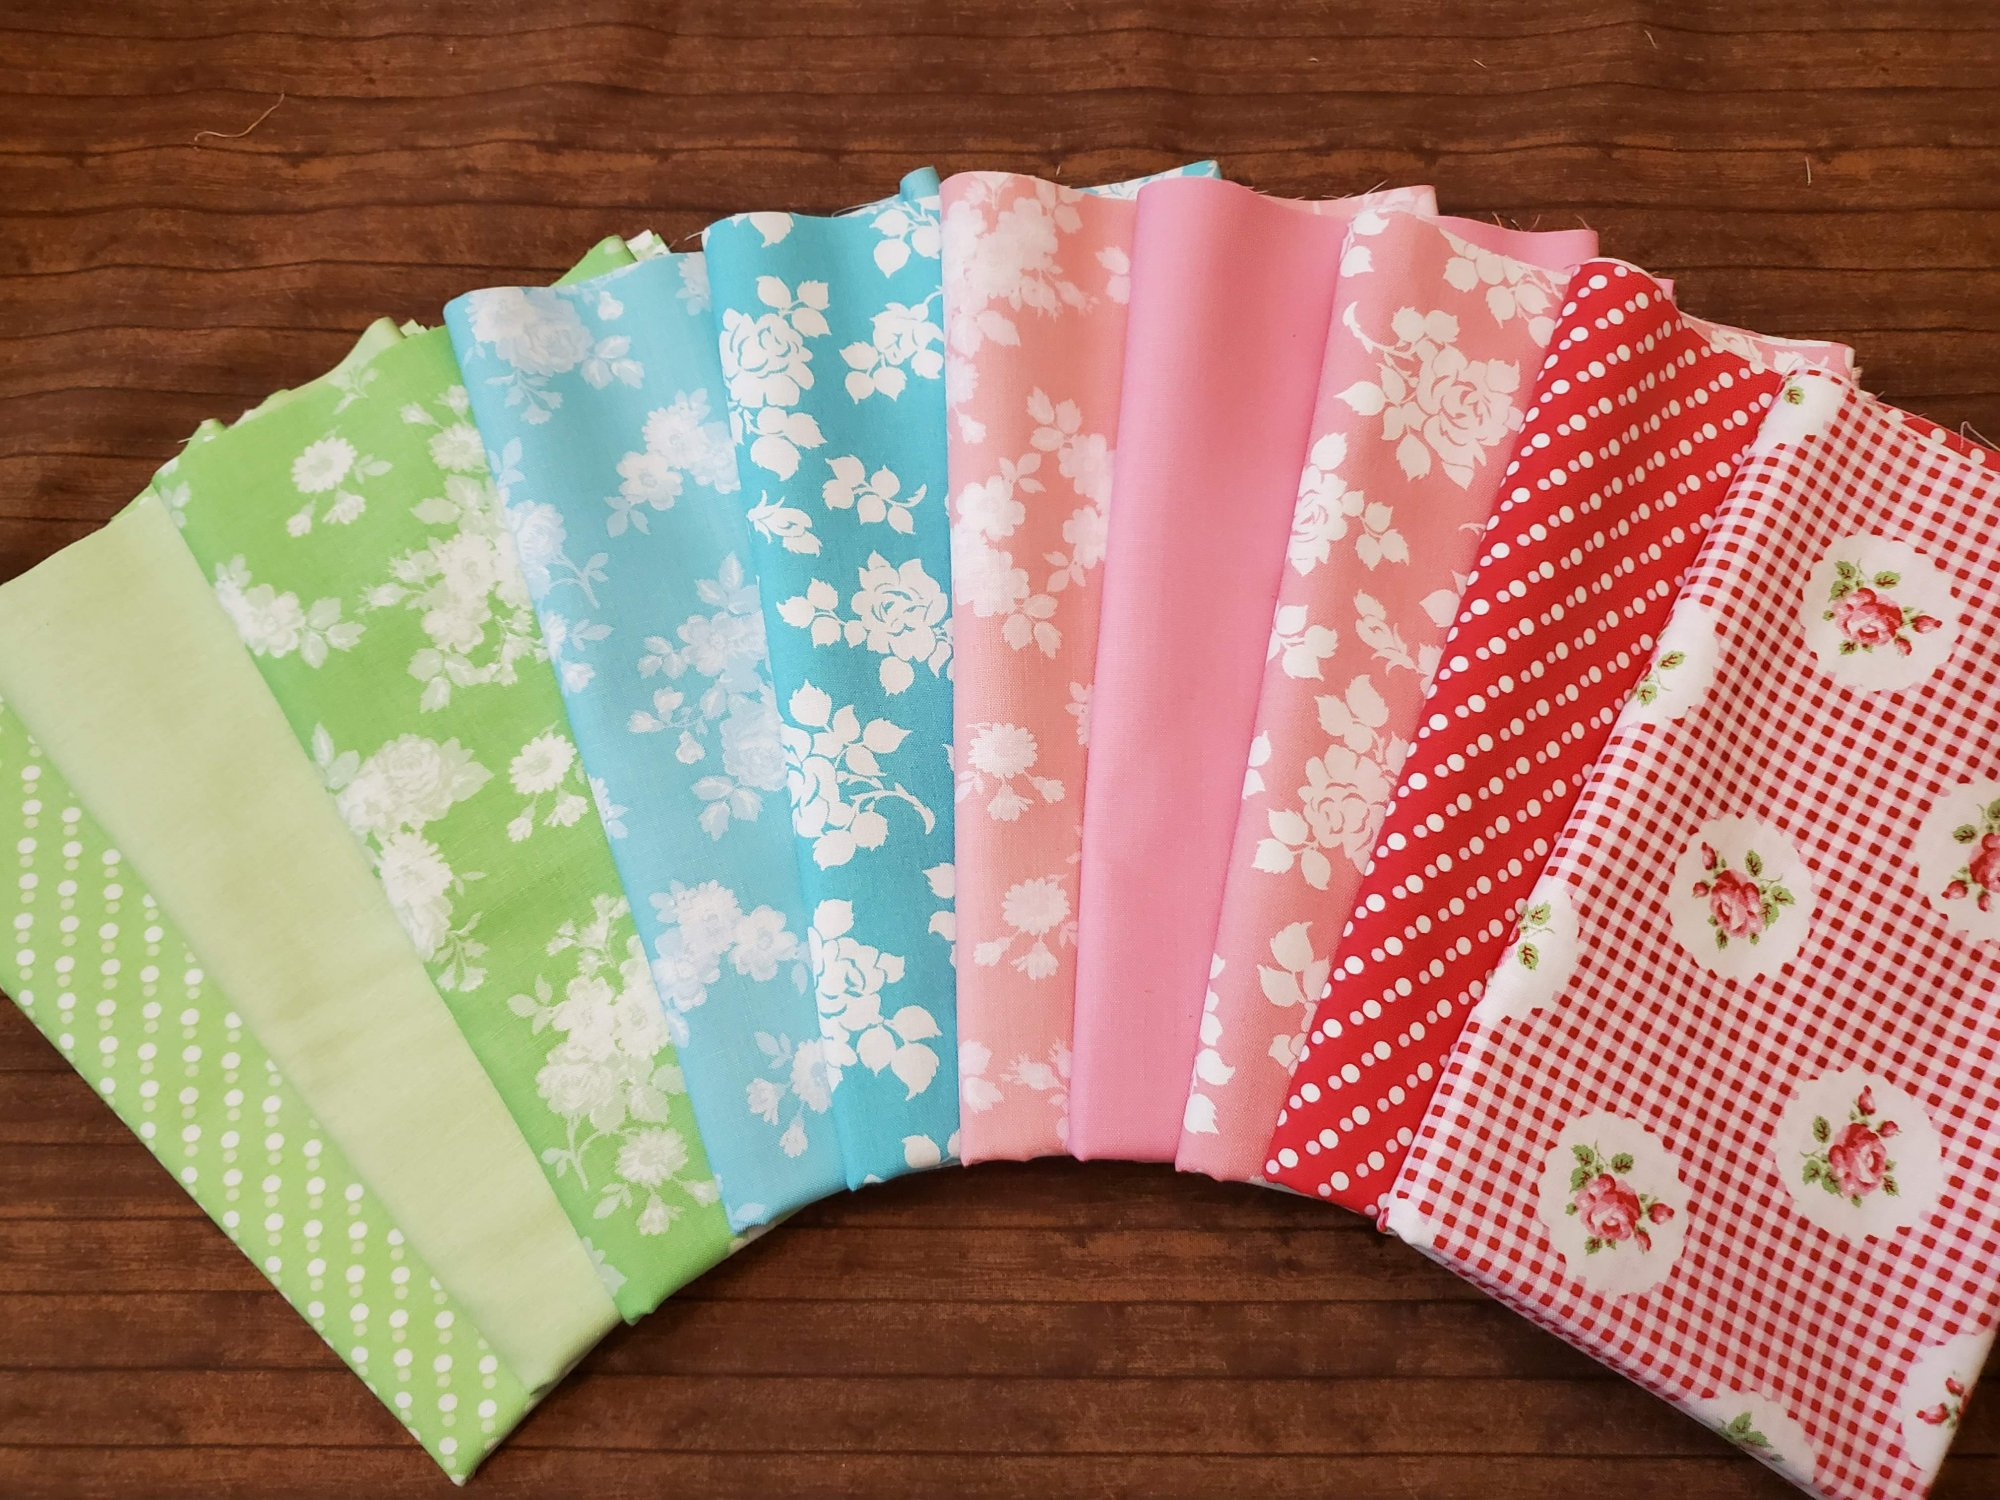 Janey by Tanya Whalen for Clothworks - 10 Piece Half Yard Bundle Pack